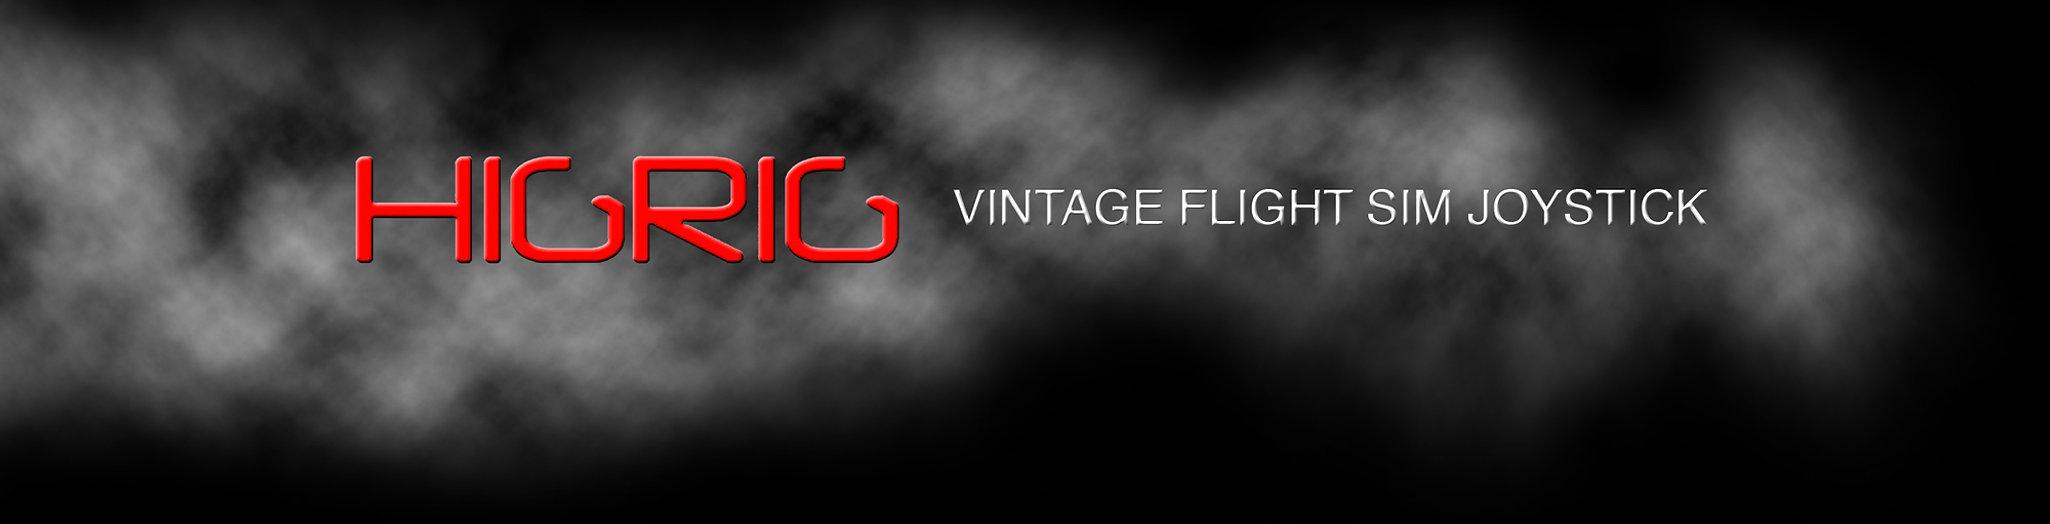 Vintage Joystick Title